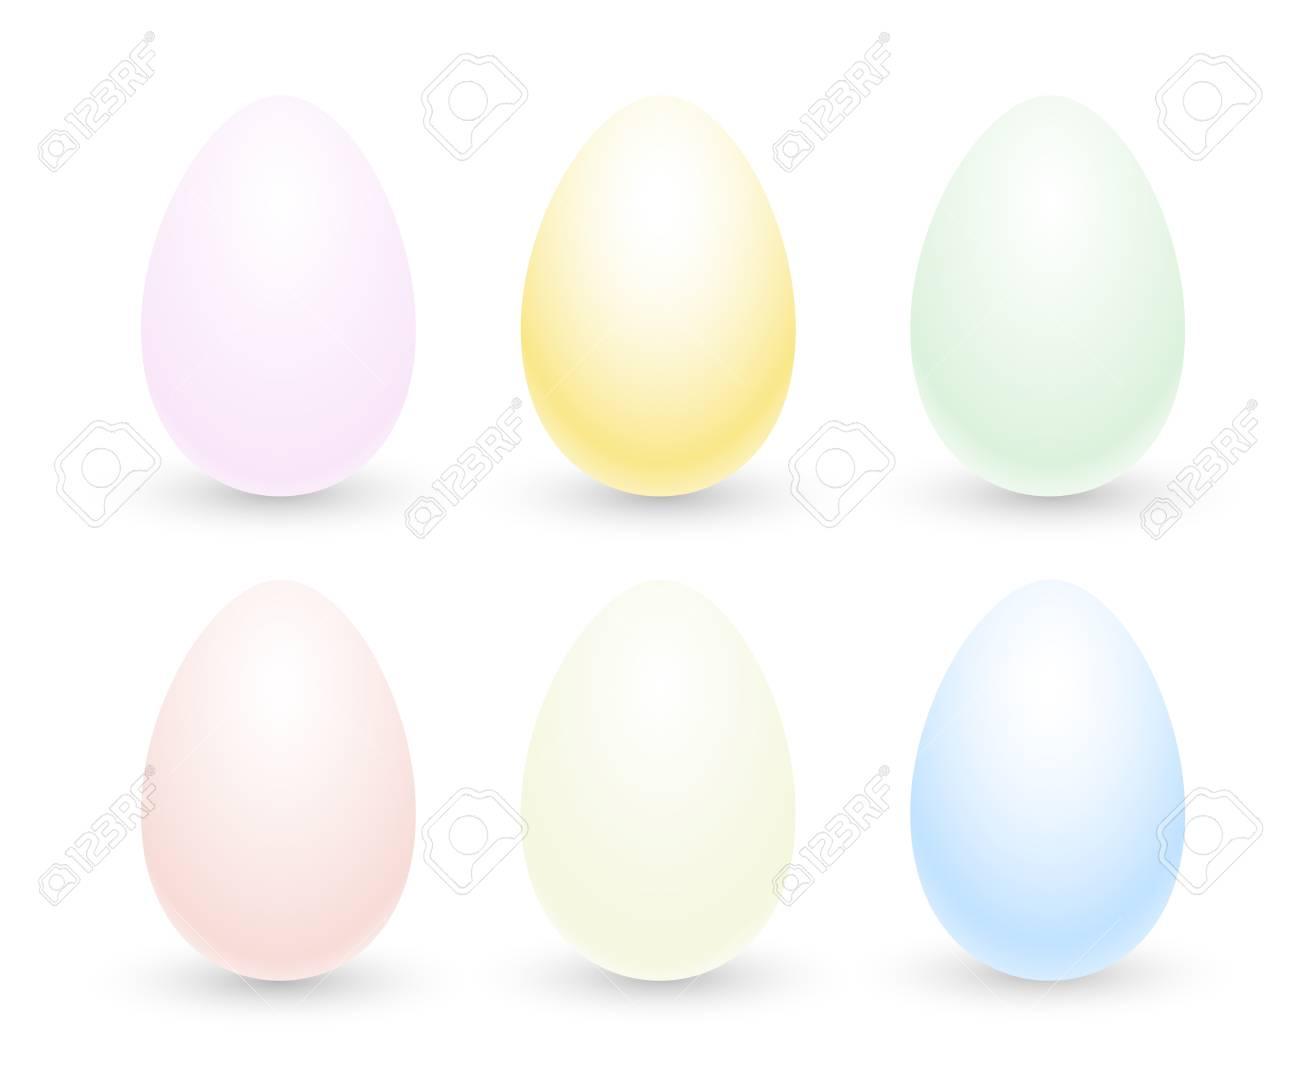 Eggs Vectors Stock Vector - 15244983